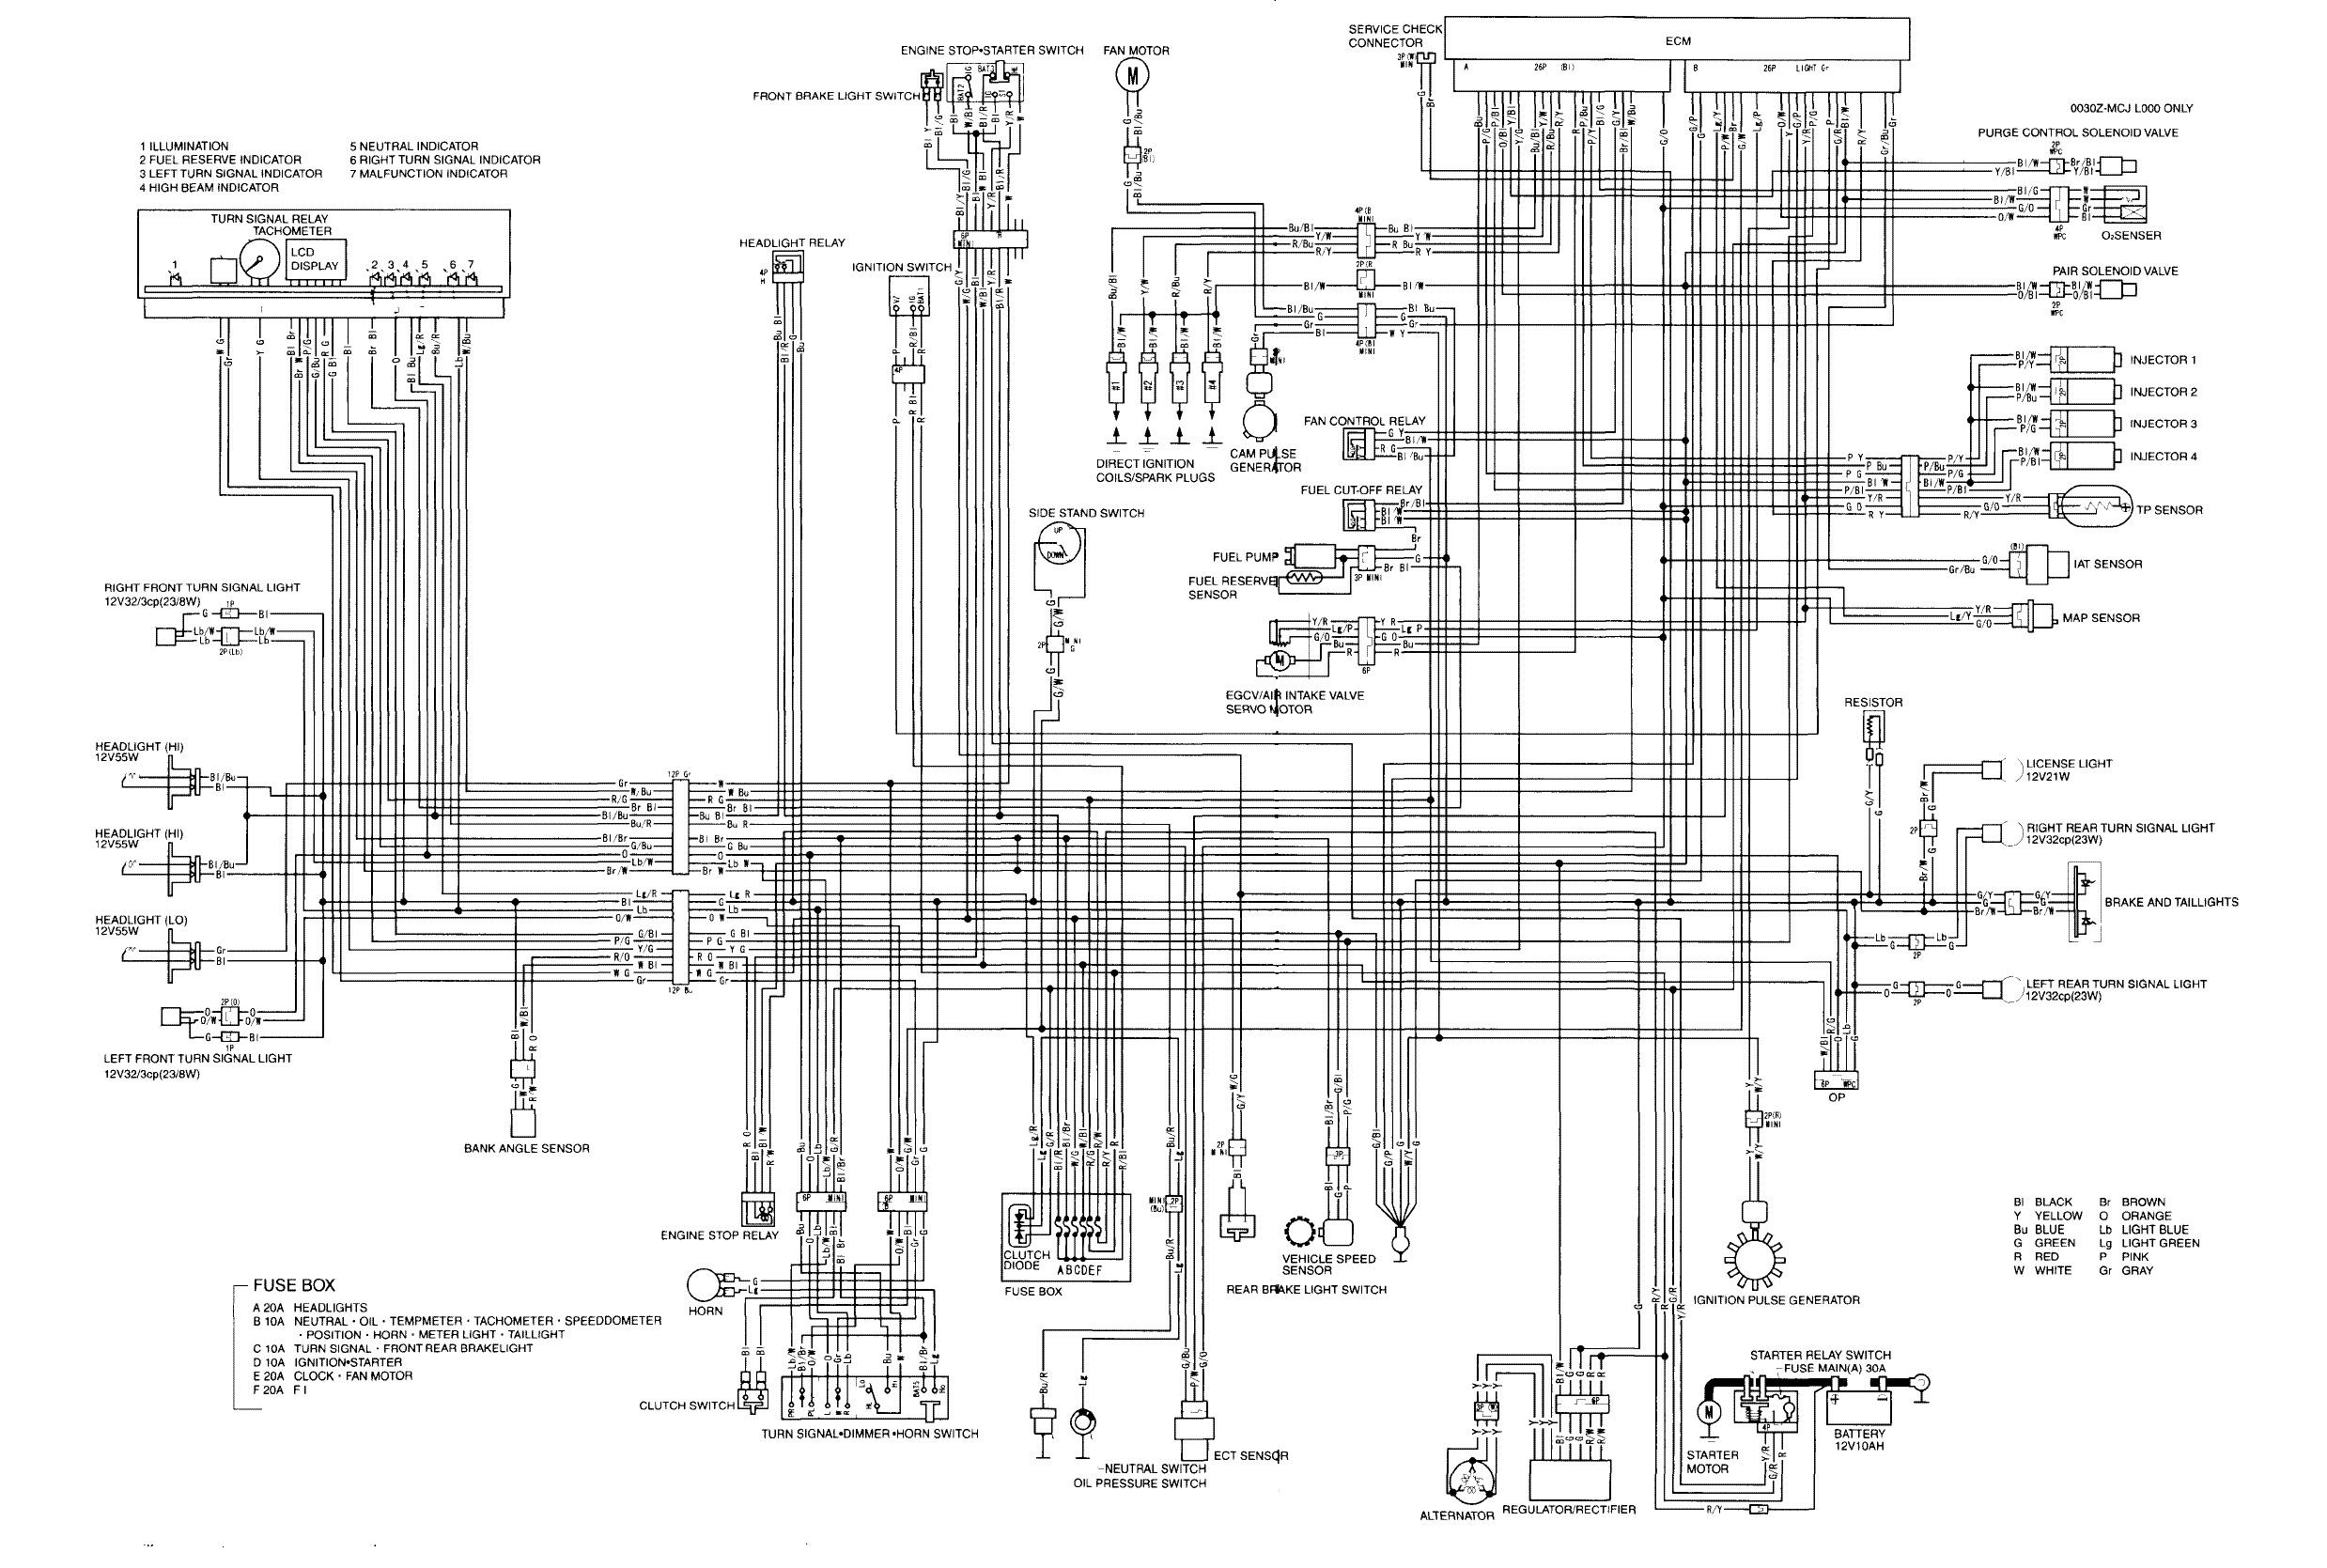 2003 honda cbr600rr wiring diagram  honda  auto wiring diagram